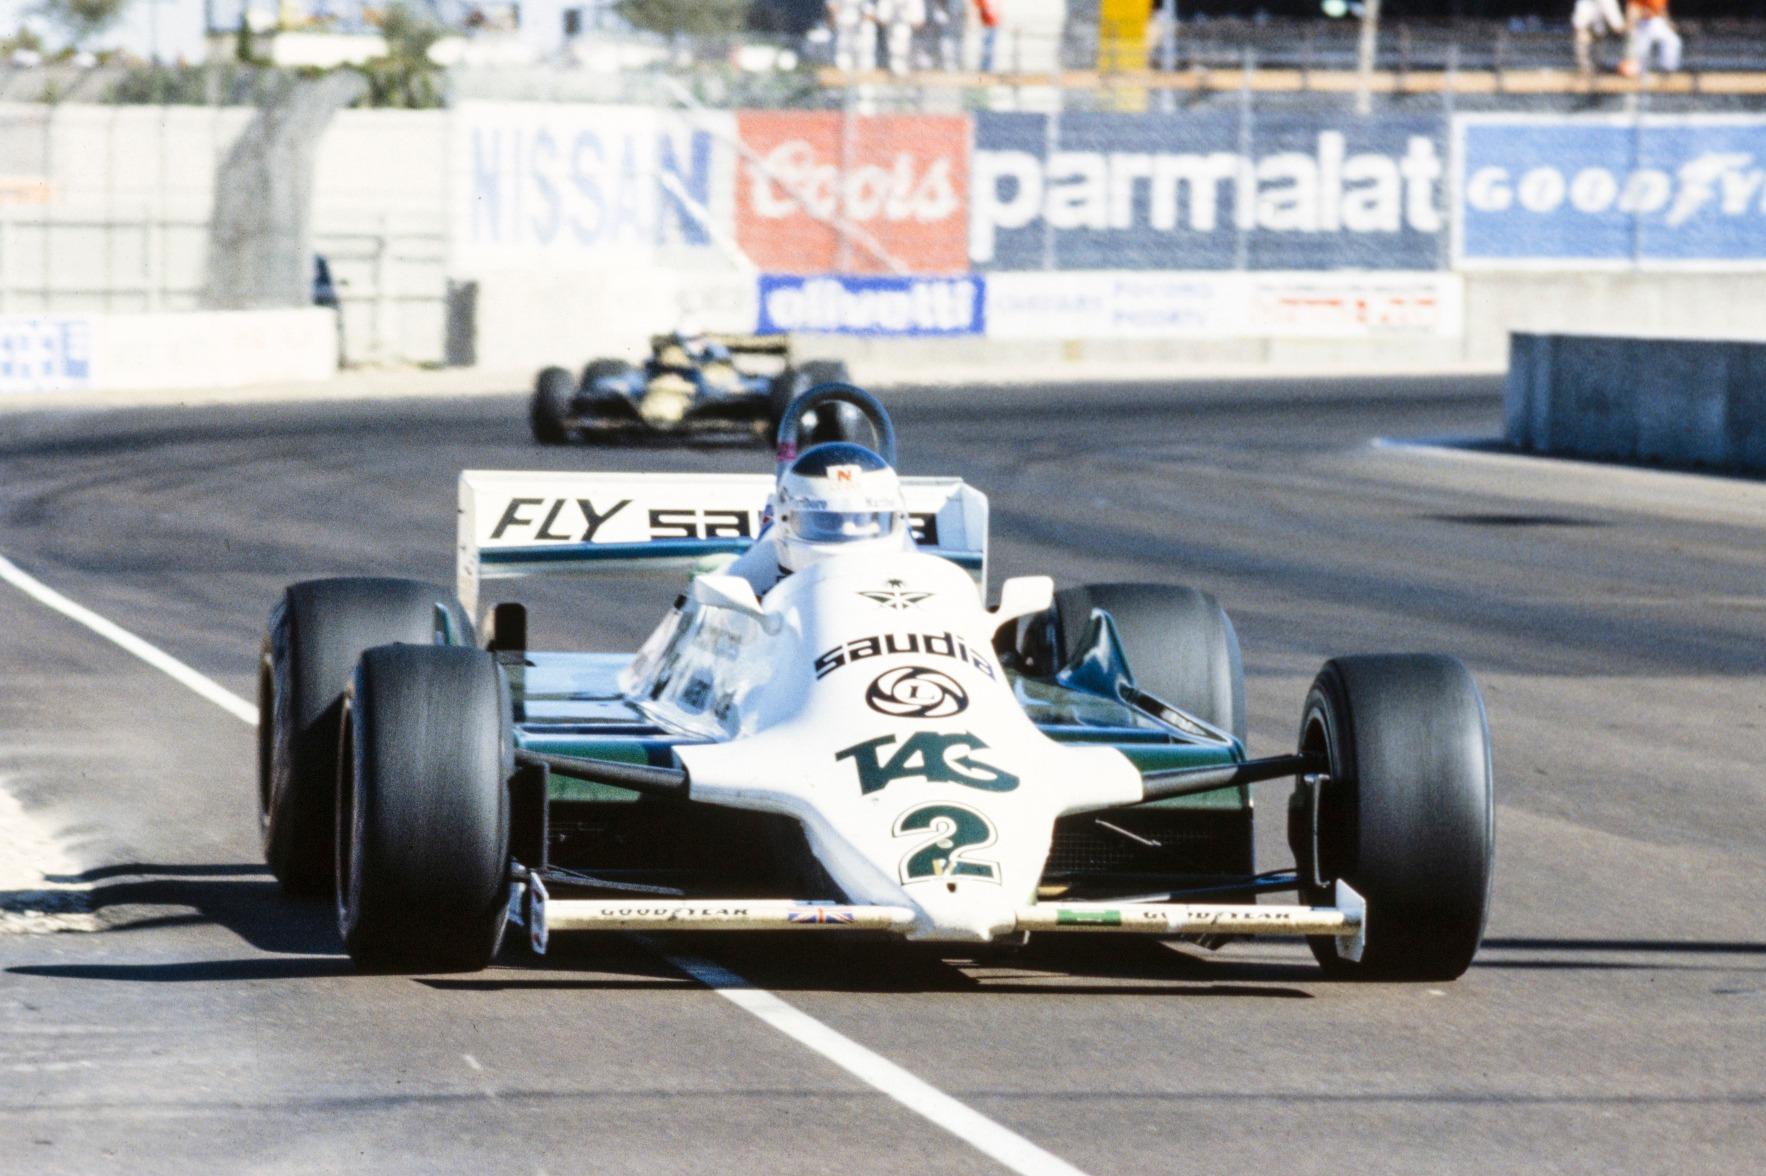 Carlos Reutemann, 1981 Las Vegas GP